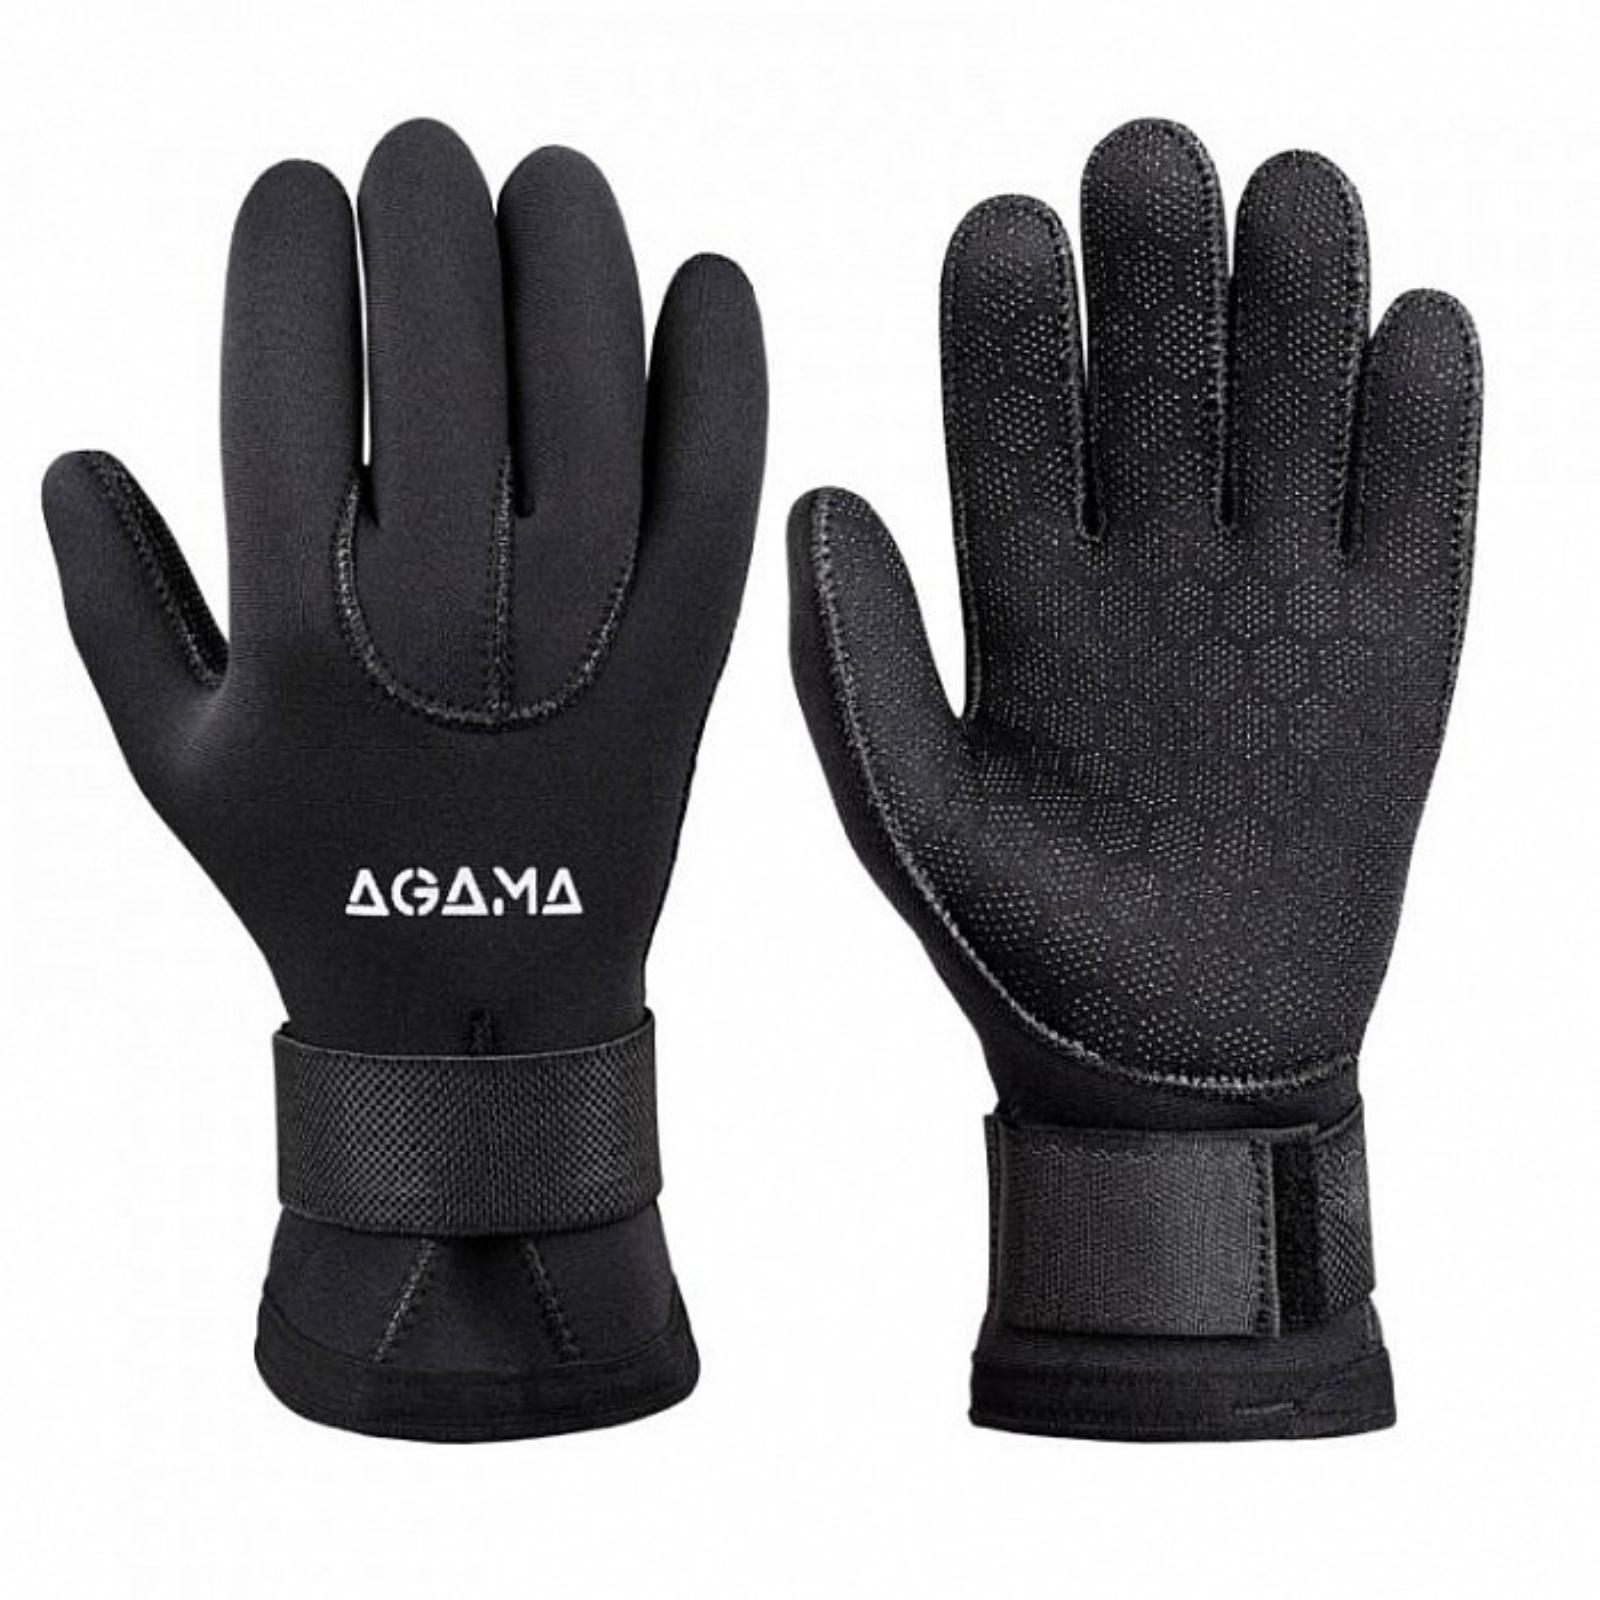 Neoprenové rukavice AGAMA Classic 5 mm - vel. XL